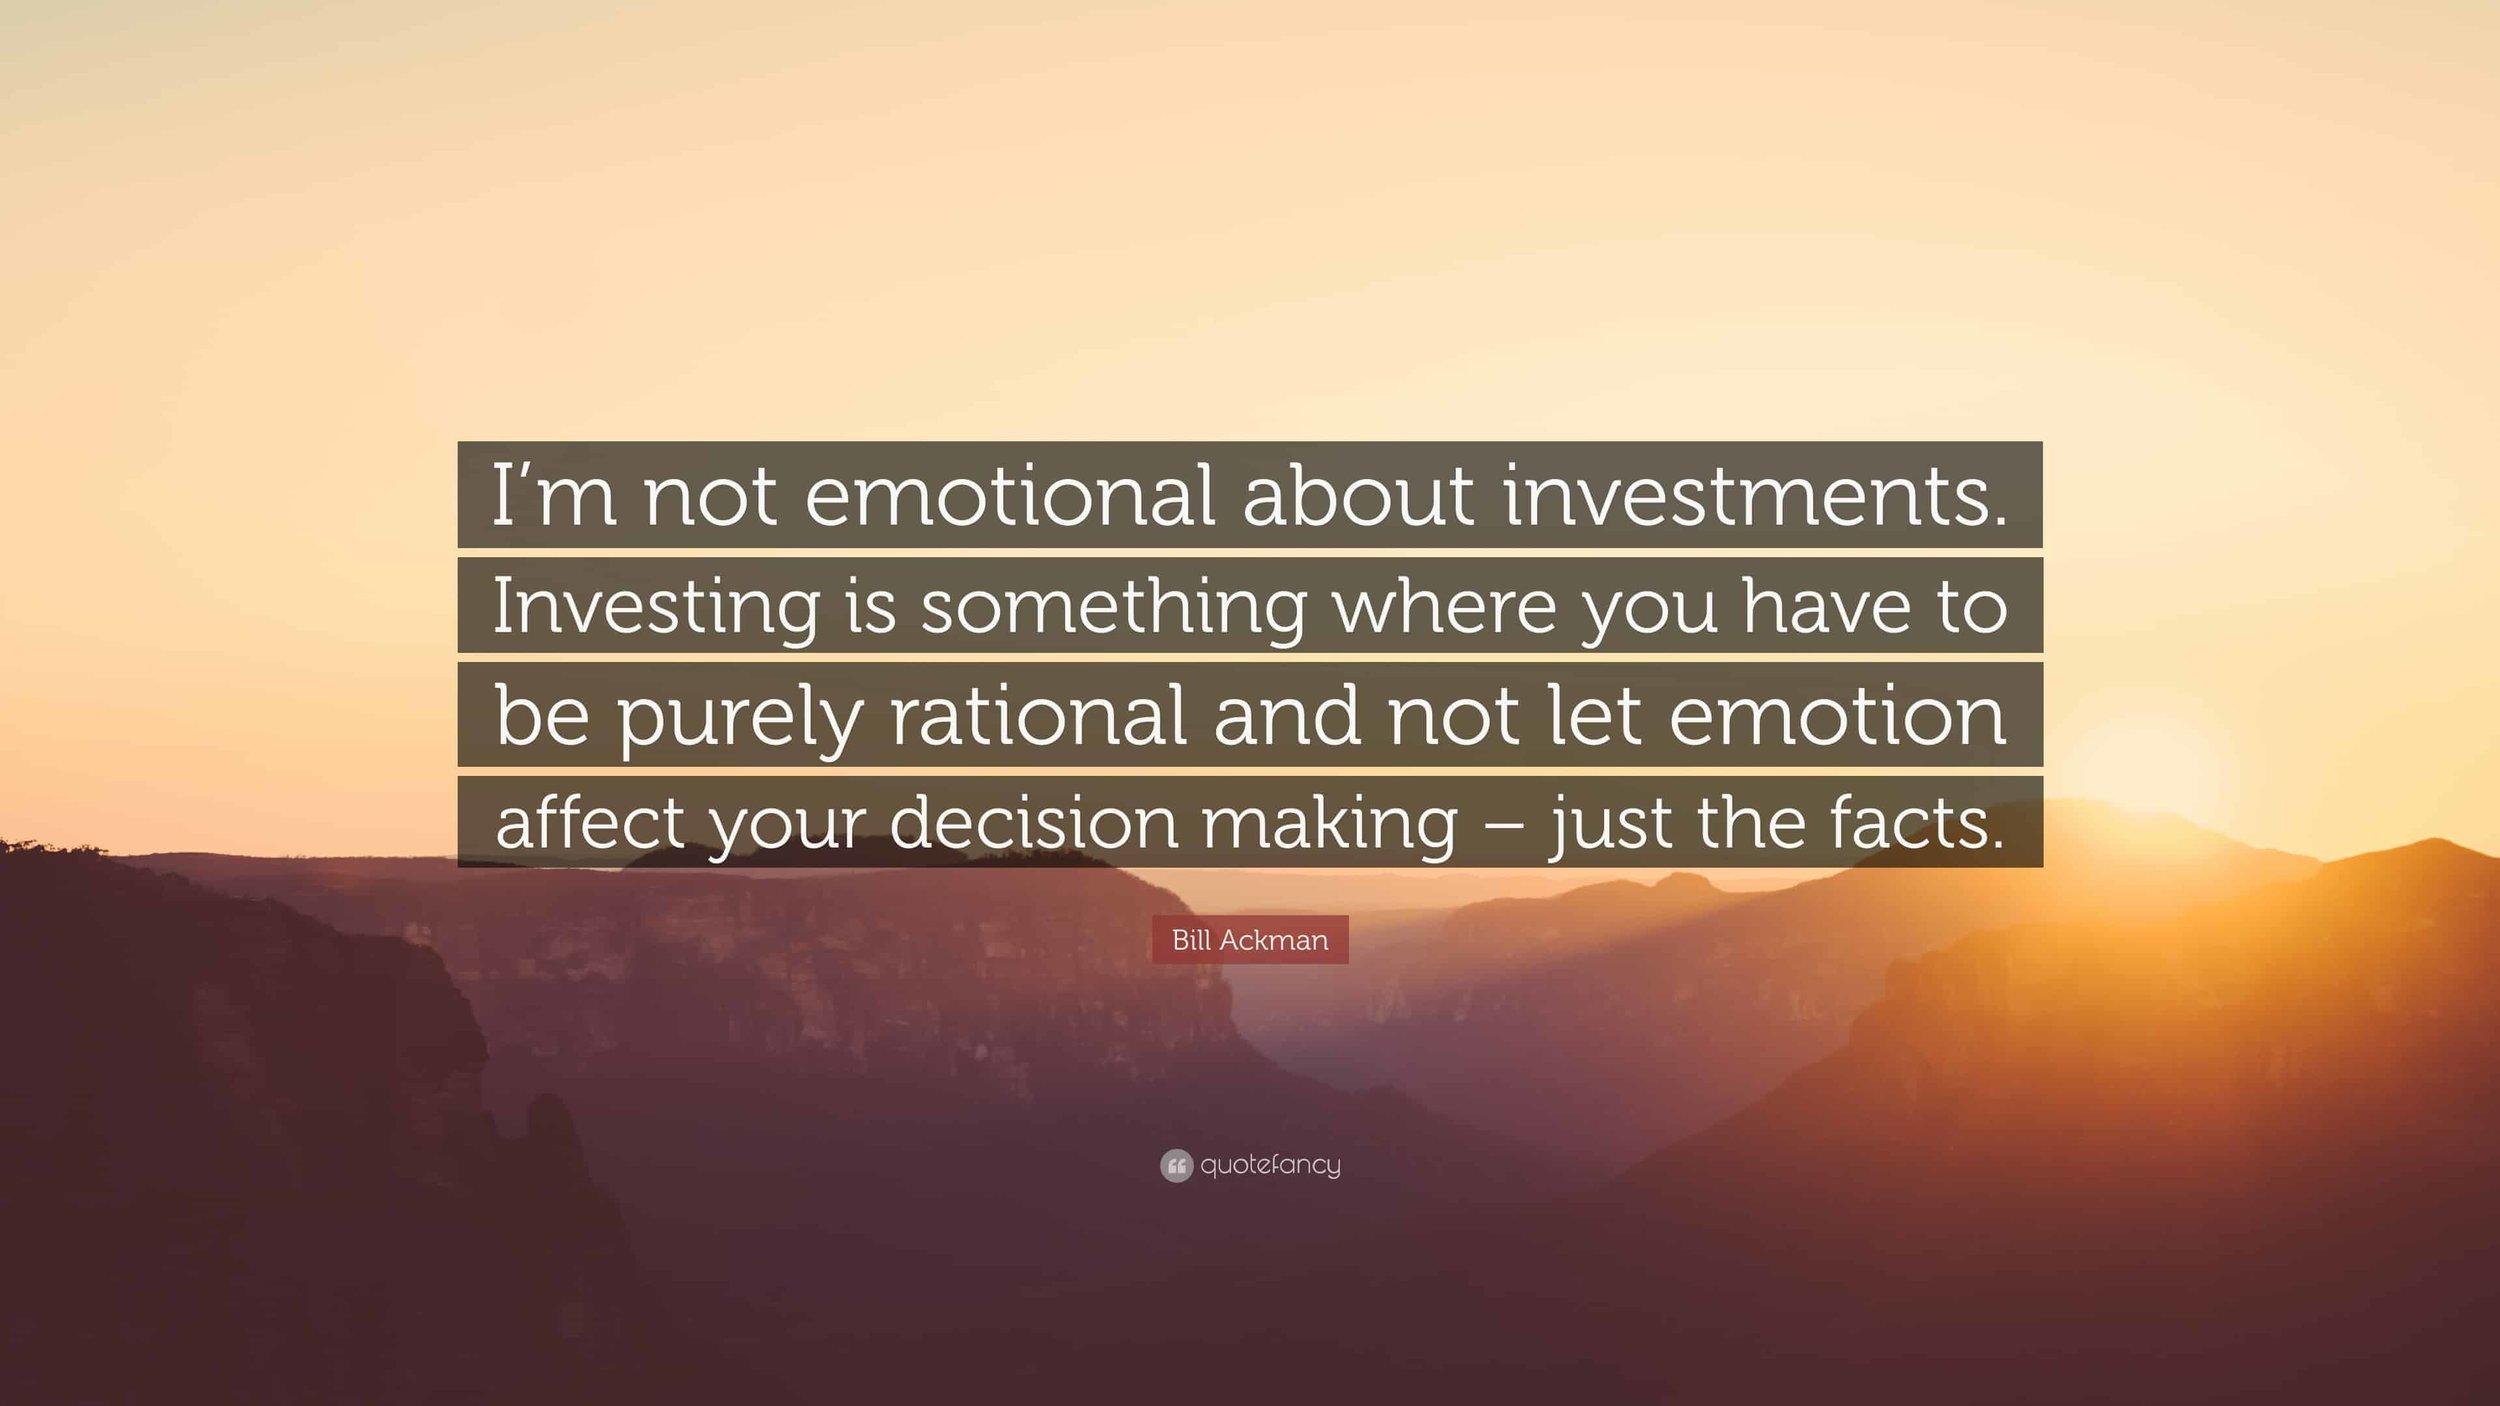 Investing-emotion.jpg